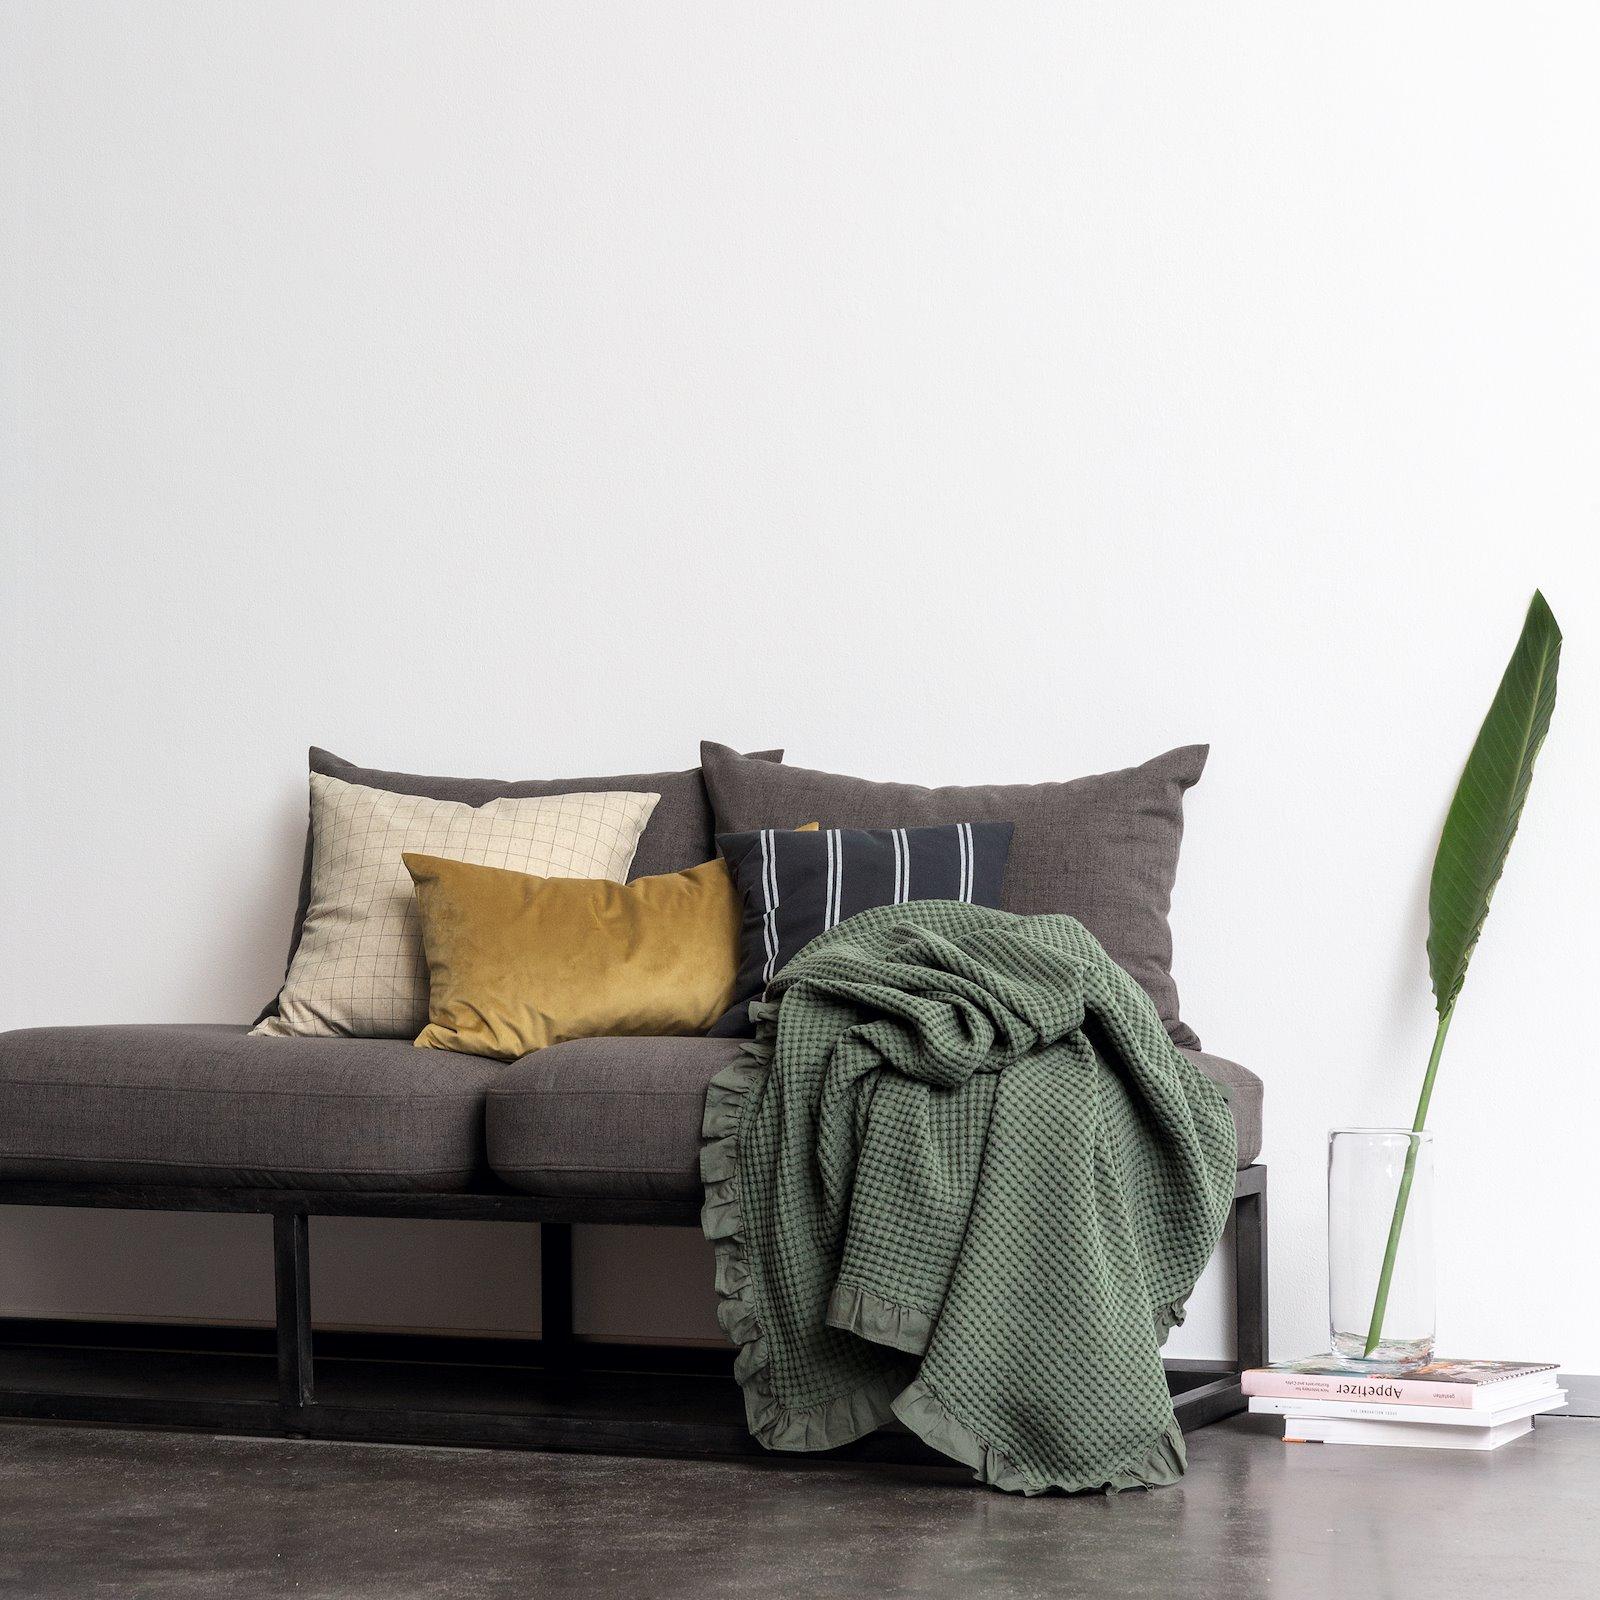 Yarn dyed check linen natural /black 824150_816260_824166_816256_501886_DIY8020_4336_bundle